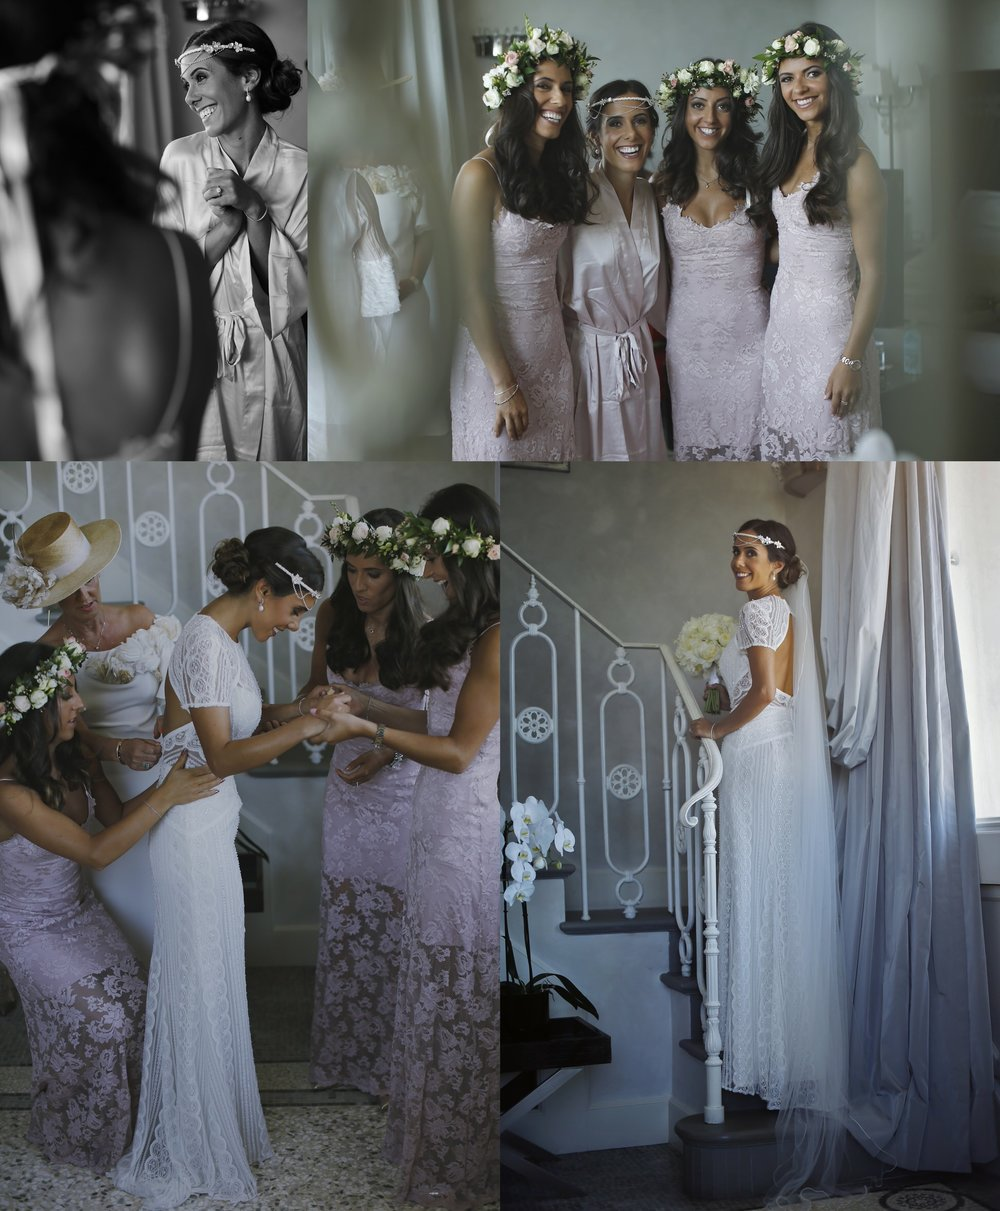 brettharkness-italy-wedding-photographer-destination-wedding-photography-weddings-in-florence_0006.jpg